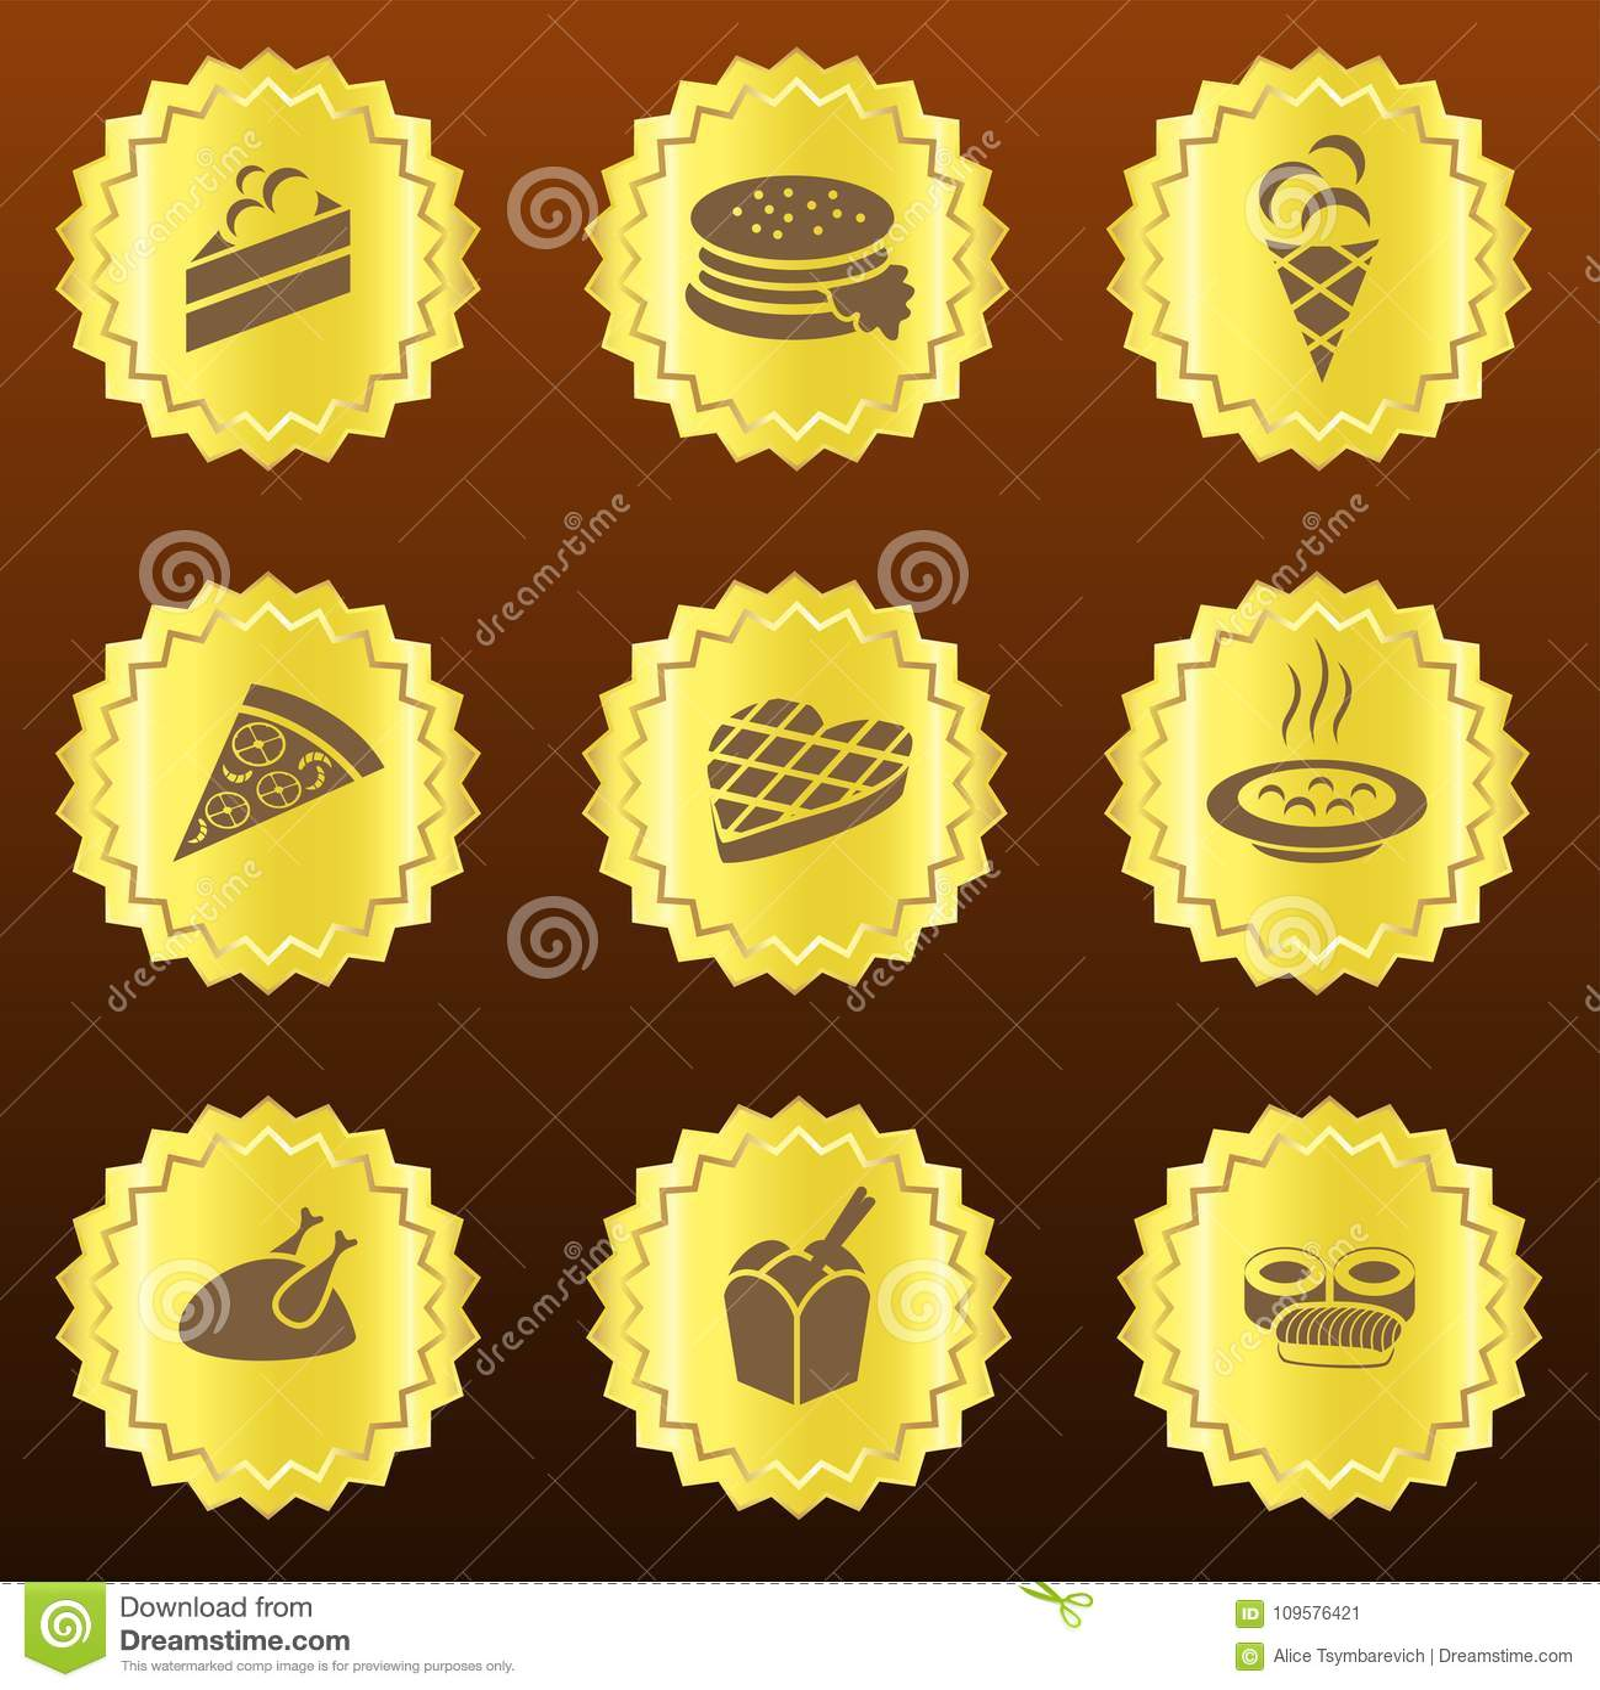 Set of golden food-related badges or medals